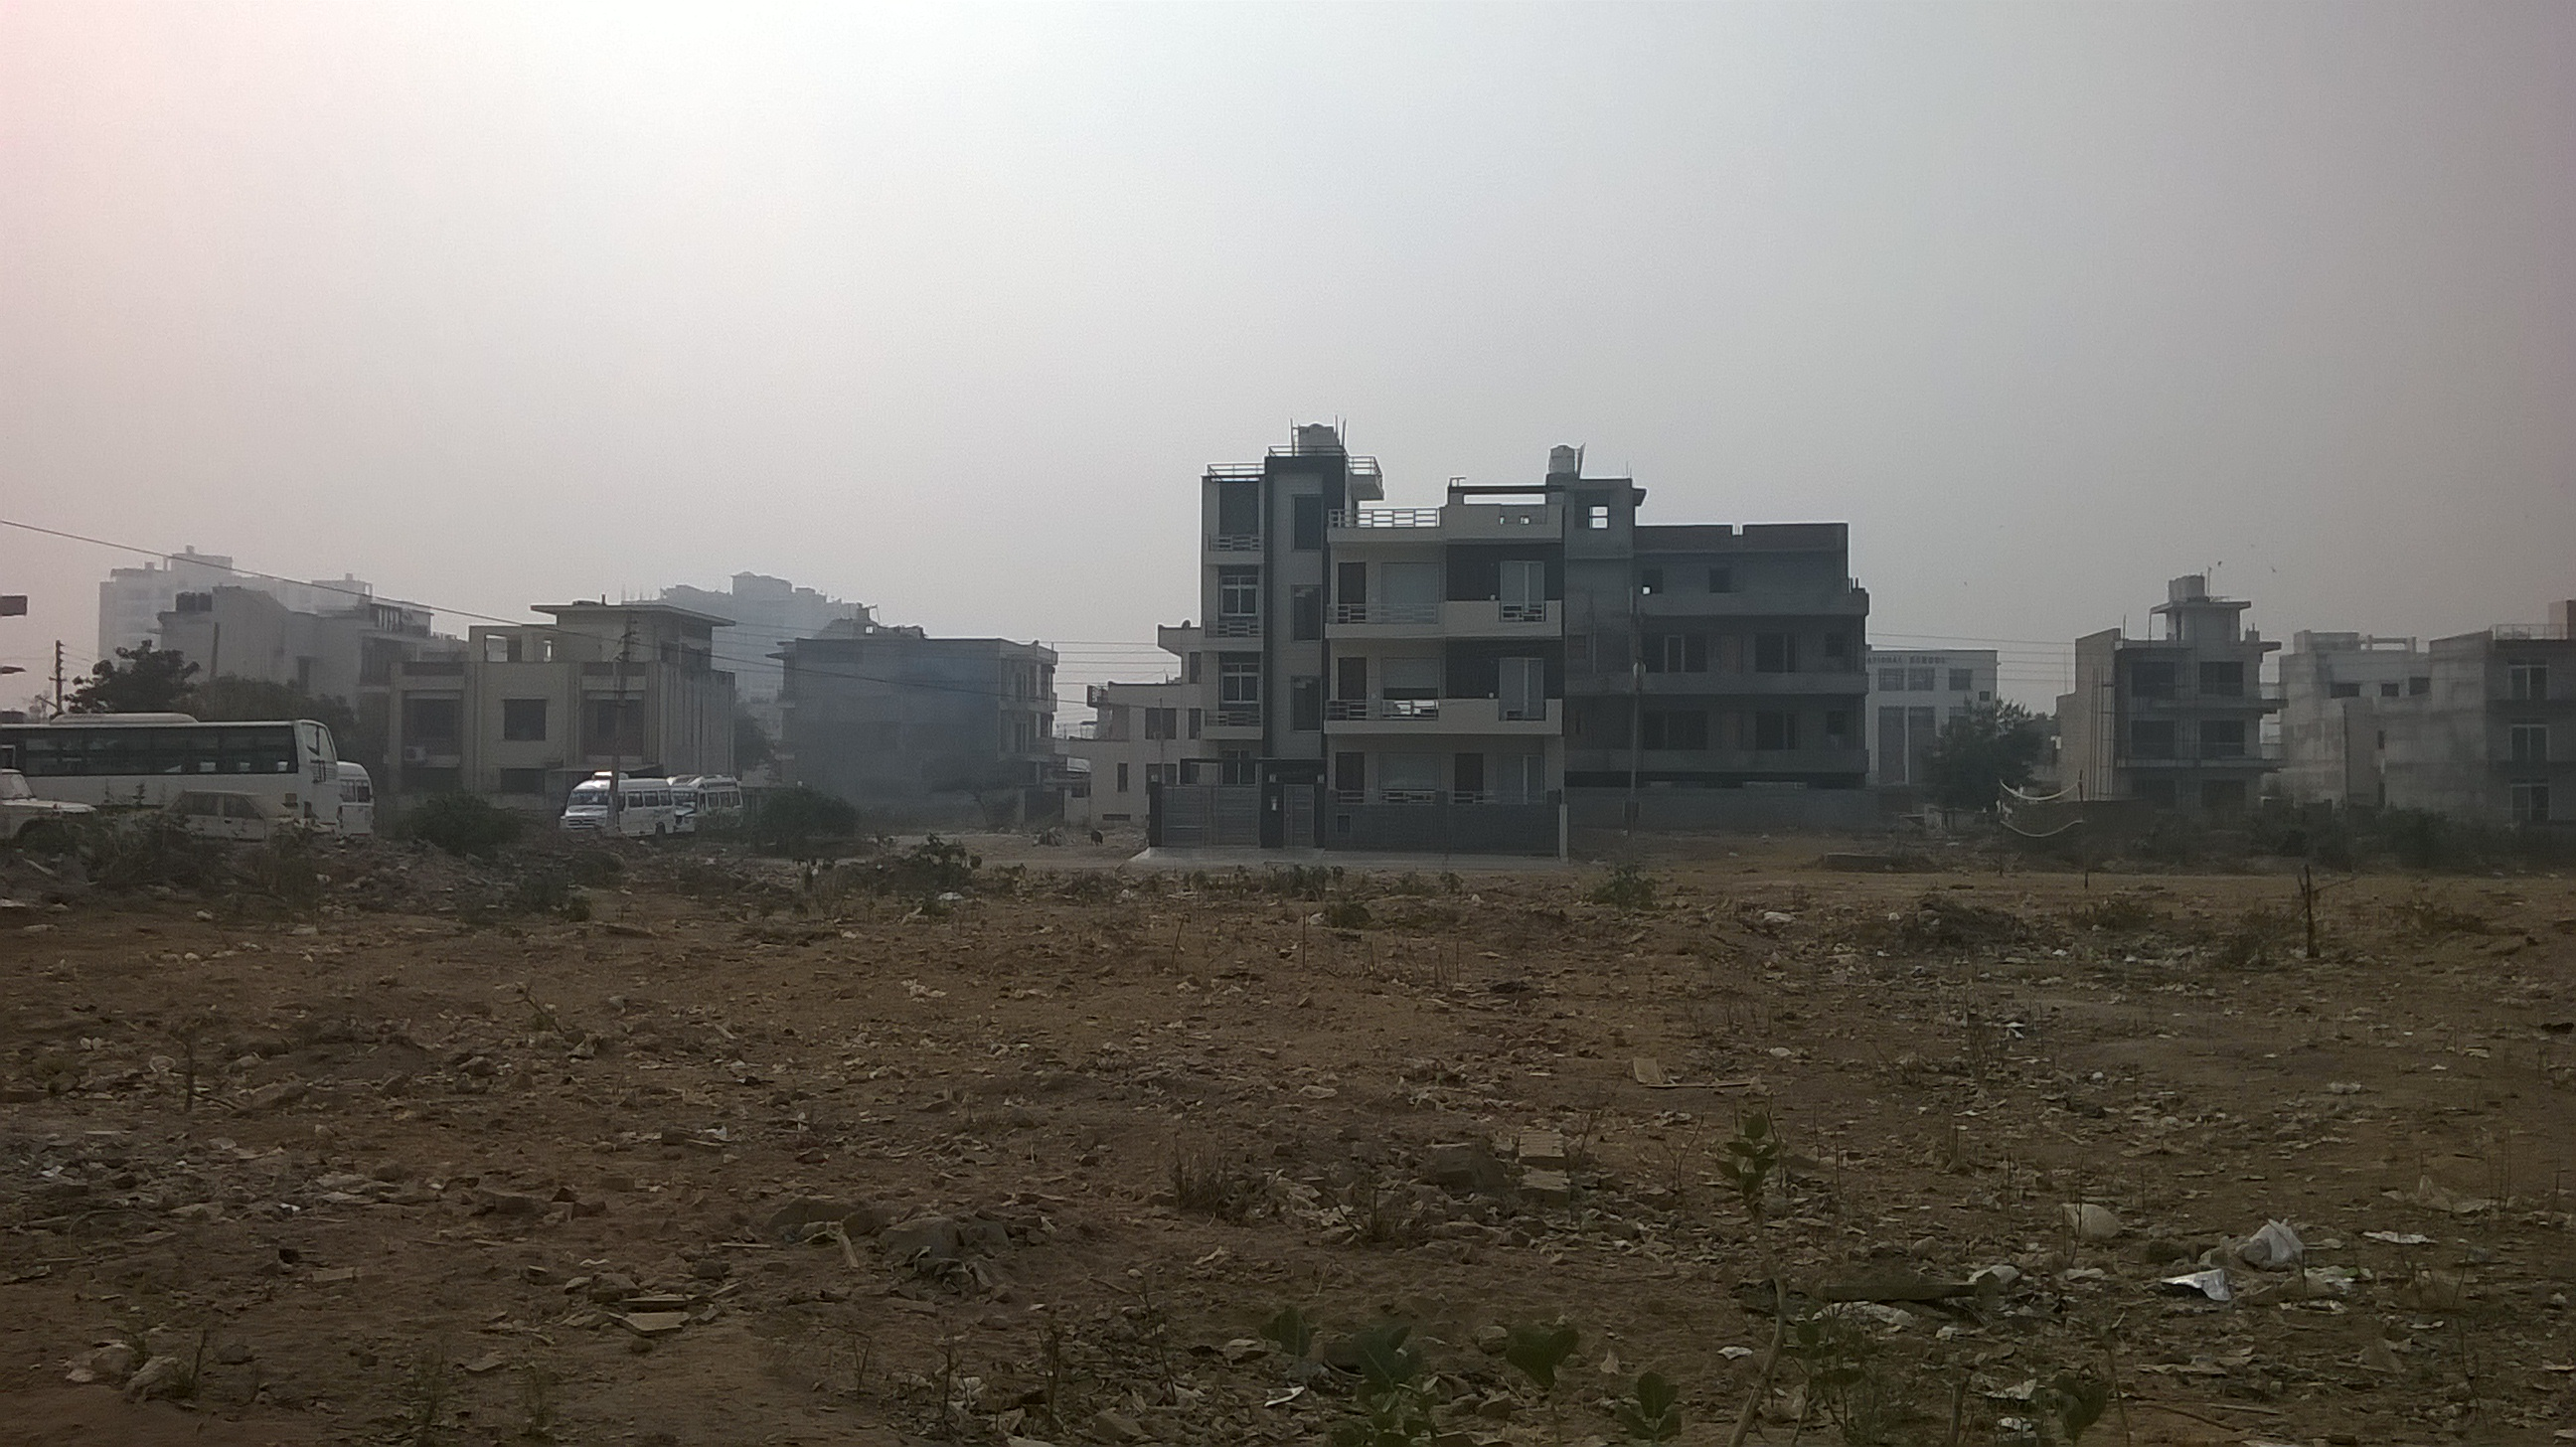 Sector 43 Gurgaon